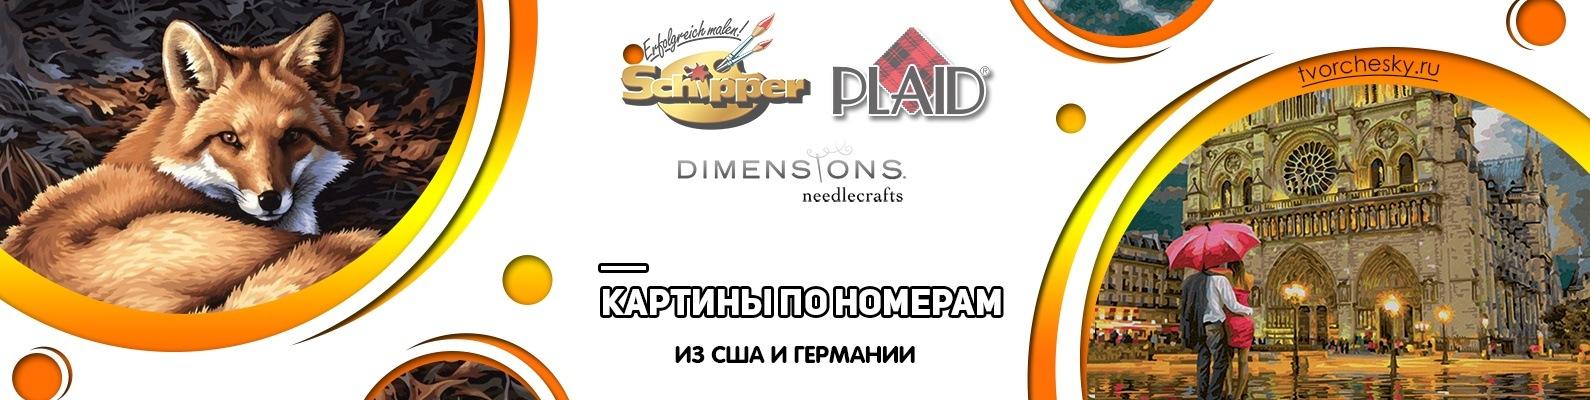 Schipper. Plaid. Dimensions - картины по номерам | ВКонтакте